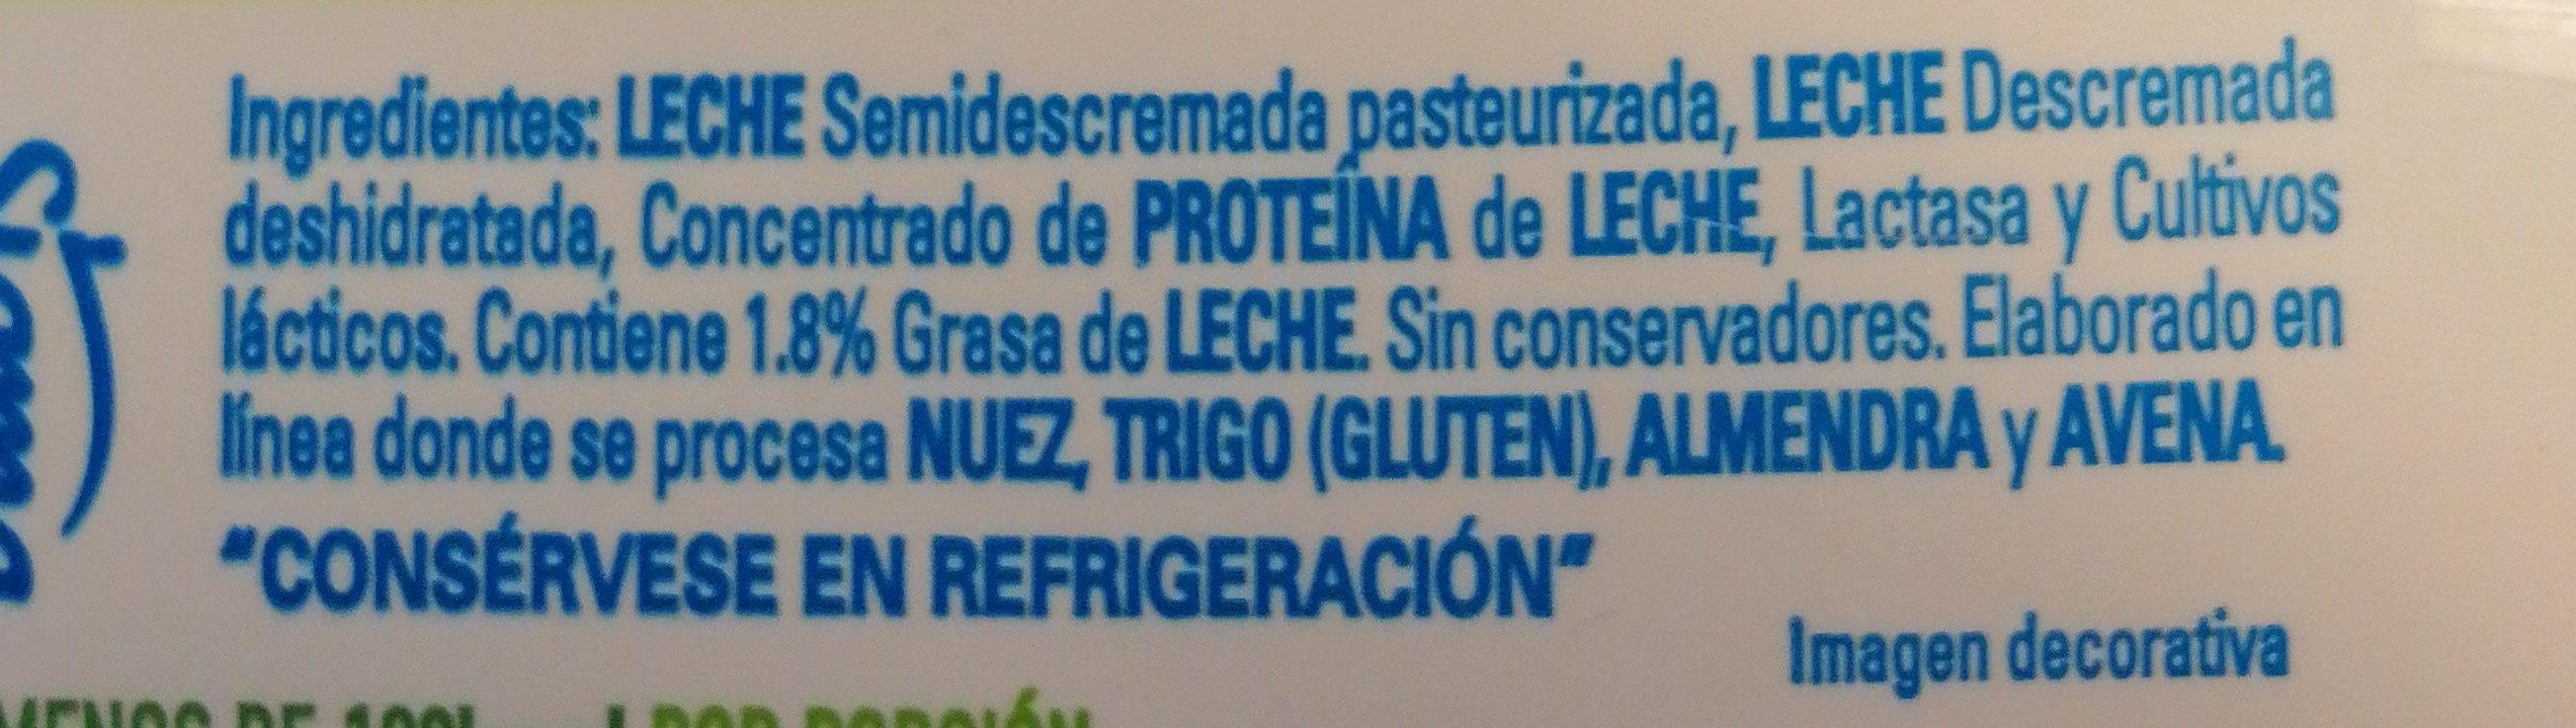 Yoghurt Griego Natural - Ingredientes - fr